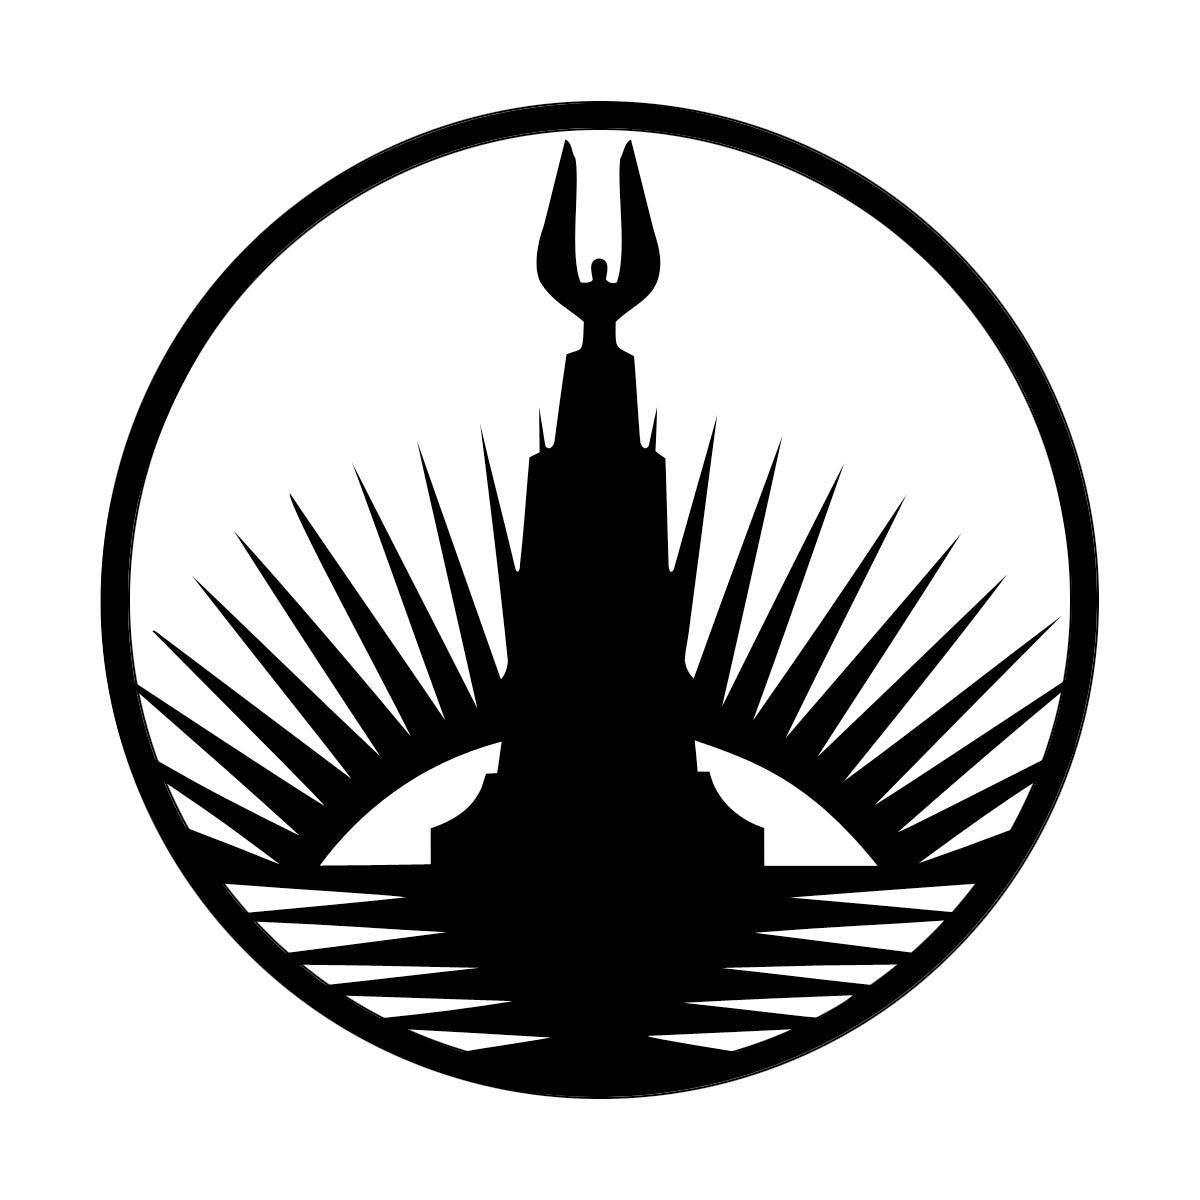 BioShock Lighthouse by Woodnutiam on DeviantArt